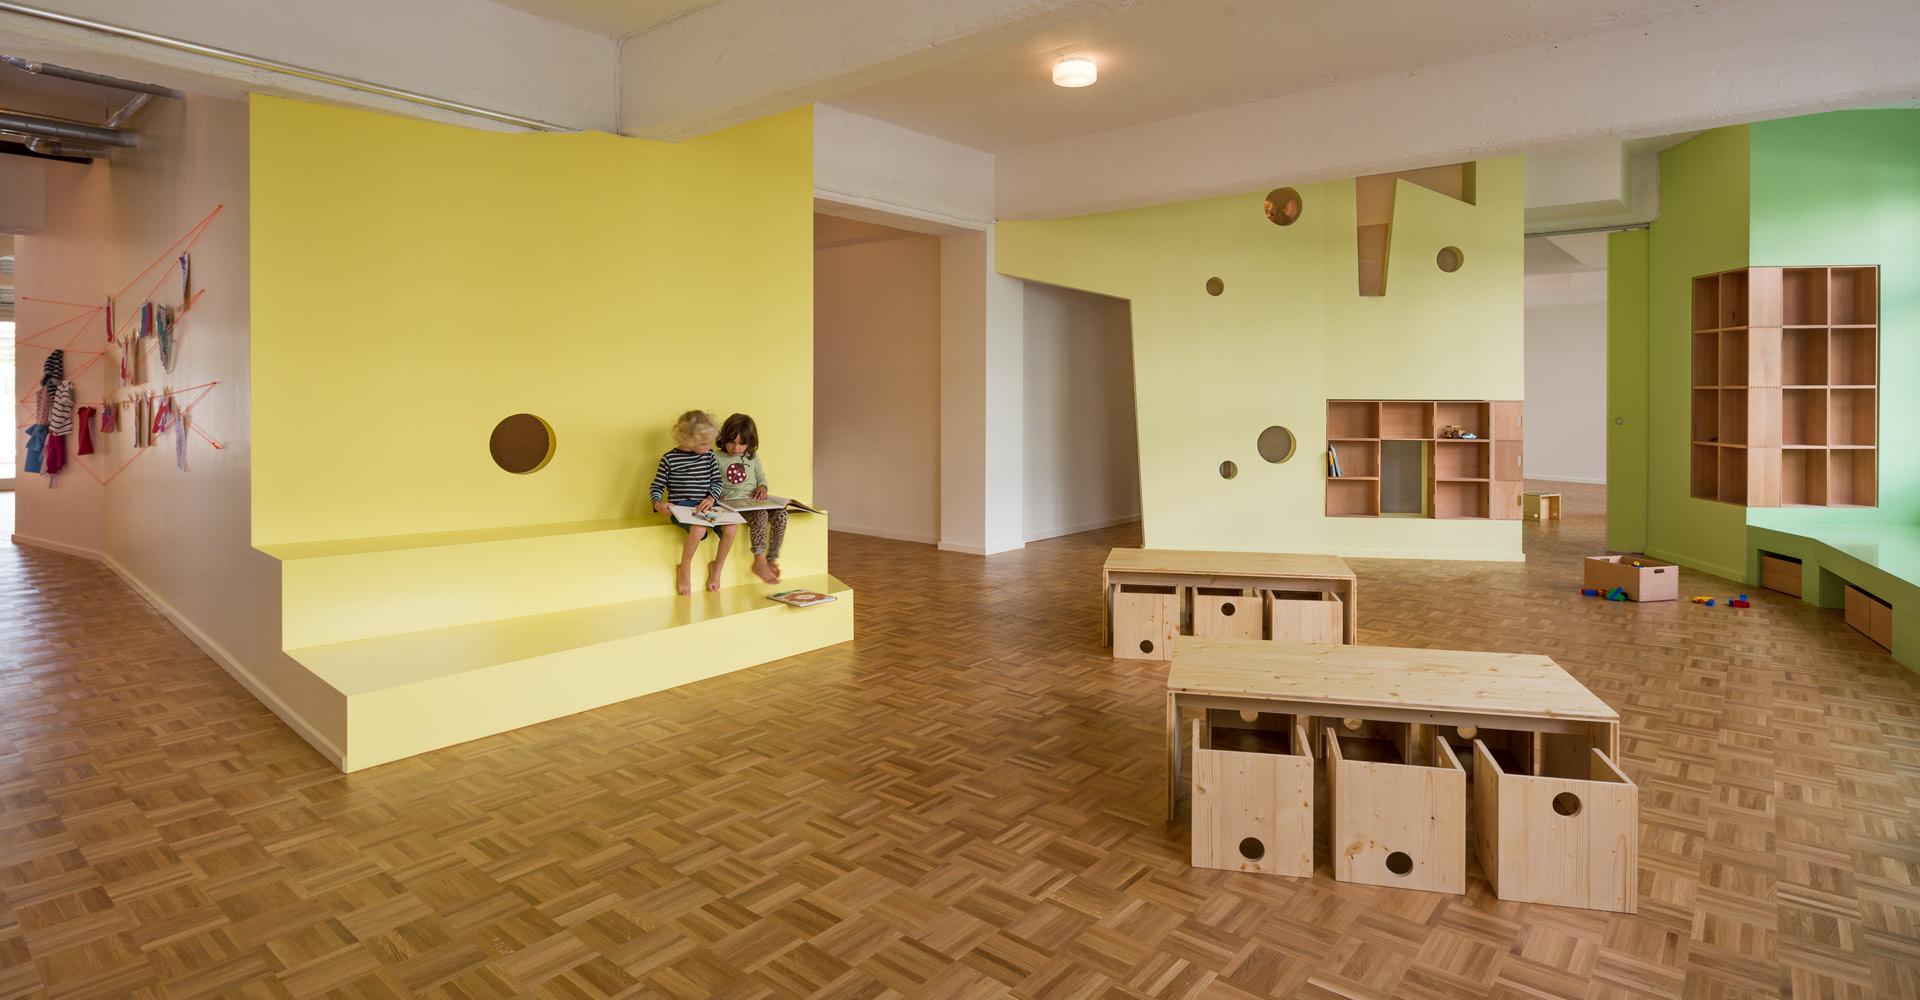 kita loftschloss baukind architekten. Black Bedroom Furniture Sets. Home Design Ideas